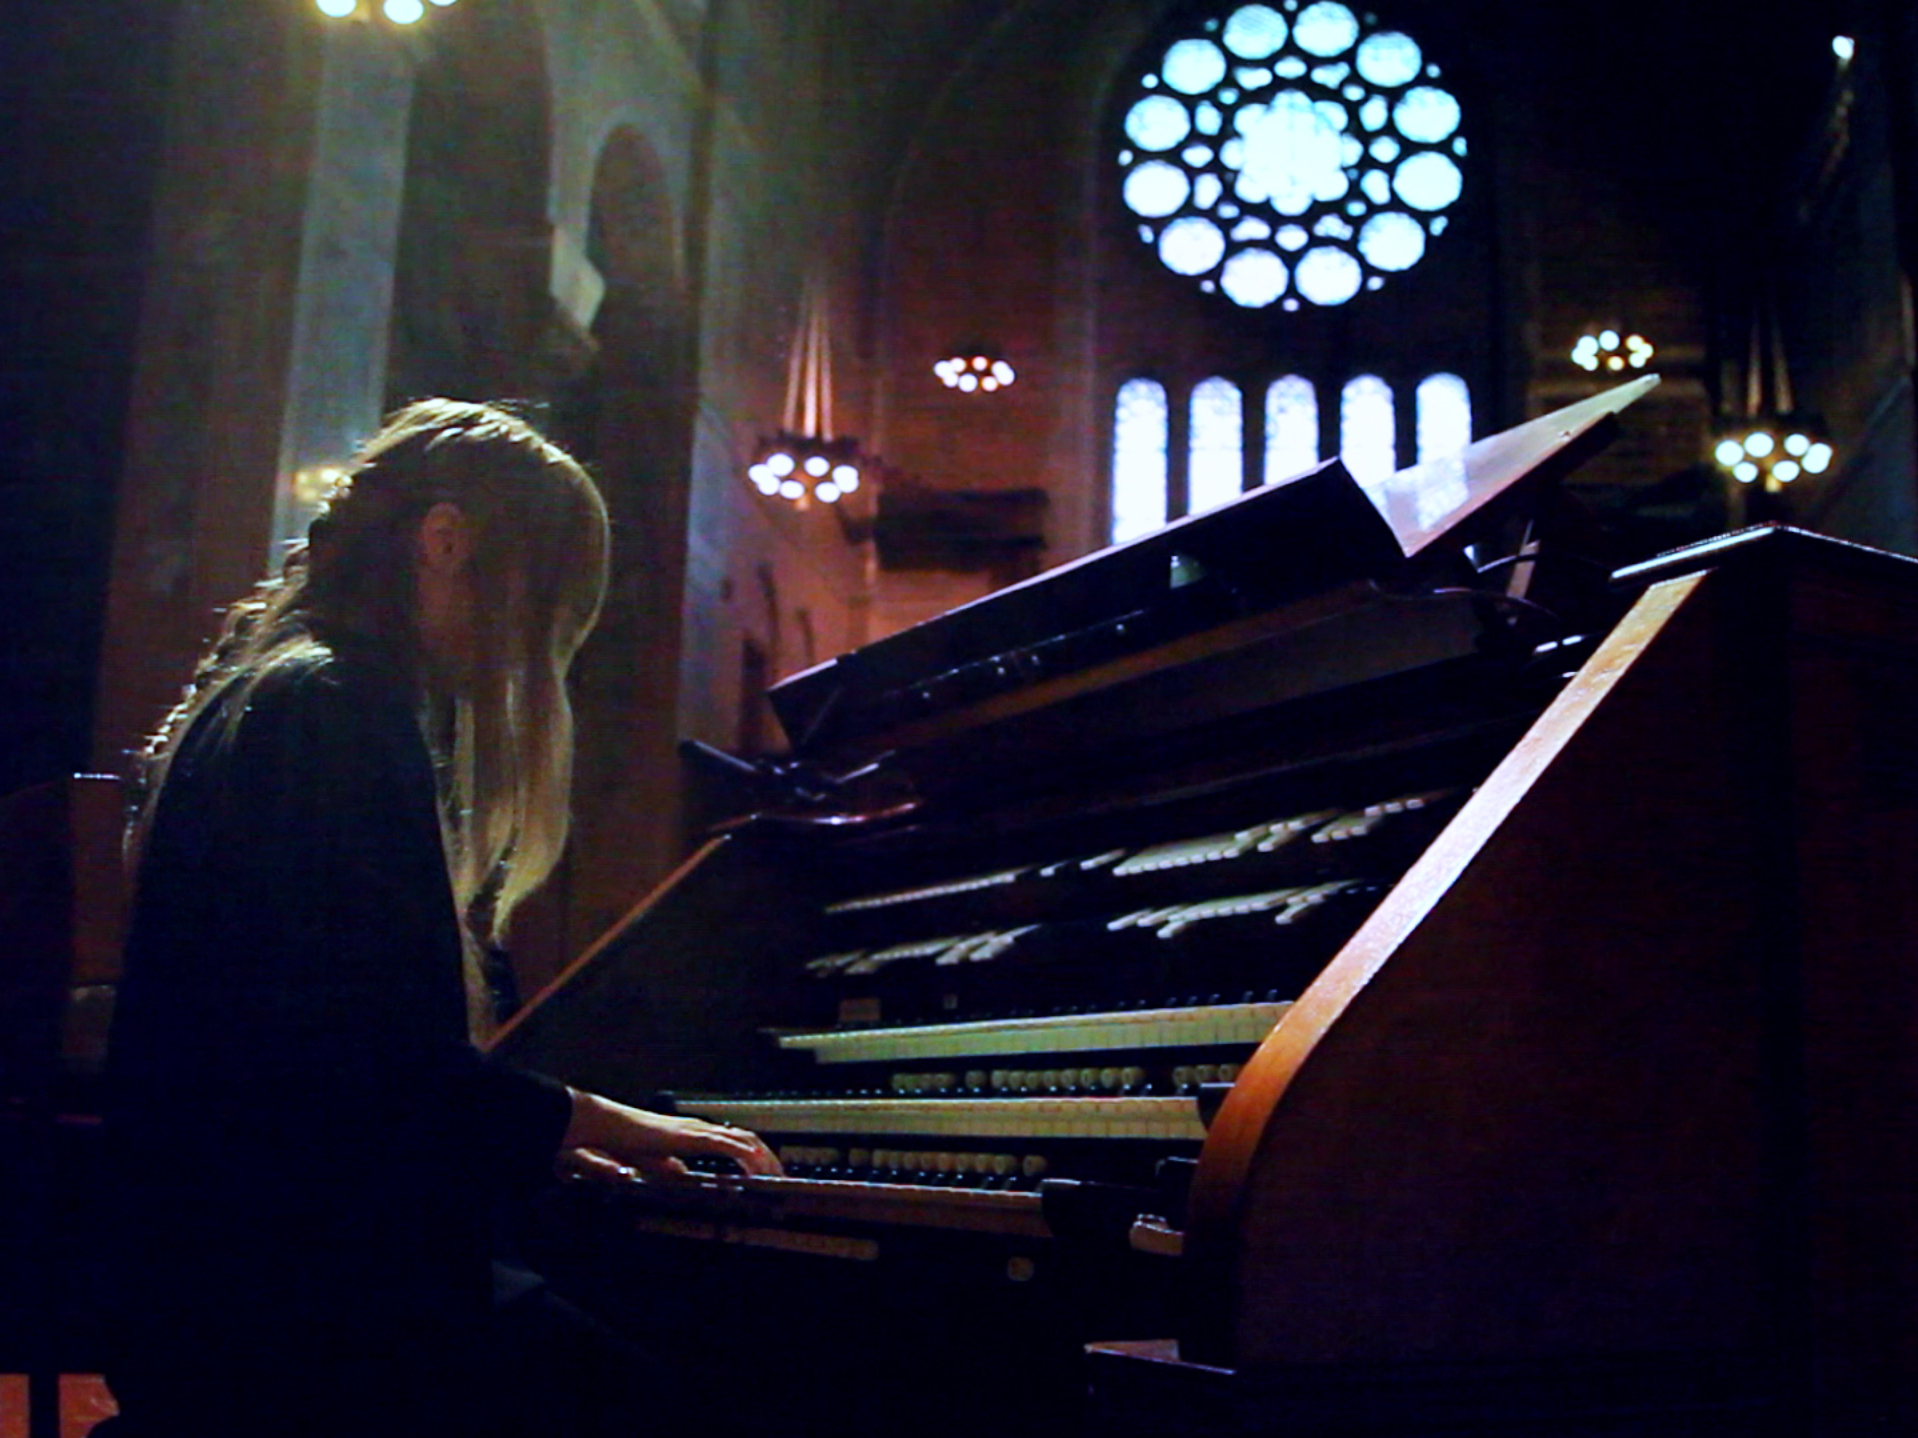 Andrea Echeverri: Anna Von Hausswolff Finds A Pipe Organ In New York City : NPR